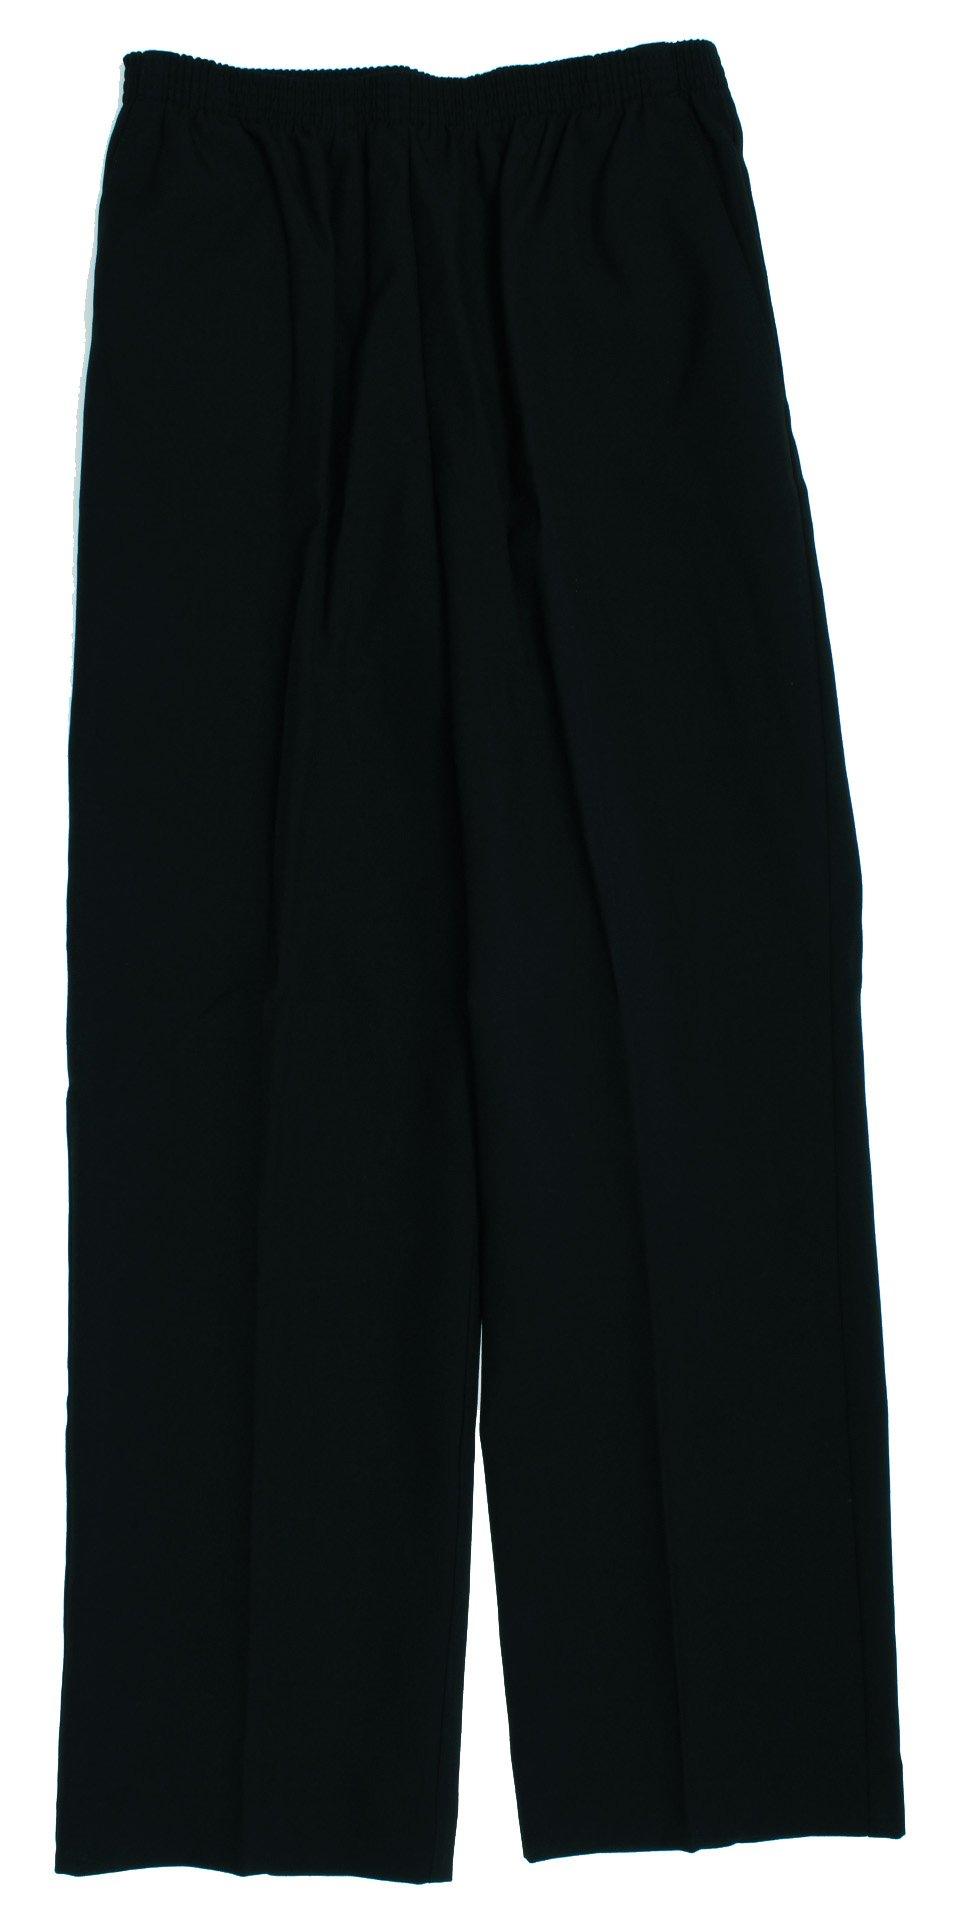 Alfred Dunner Classics Woven Elastic Waist Pants Black 8 M